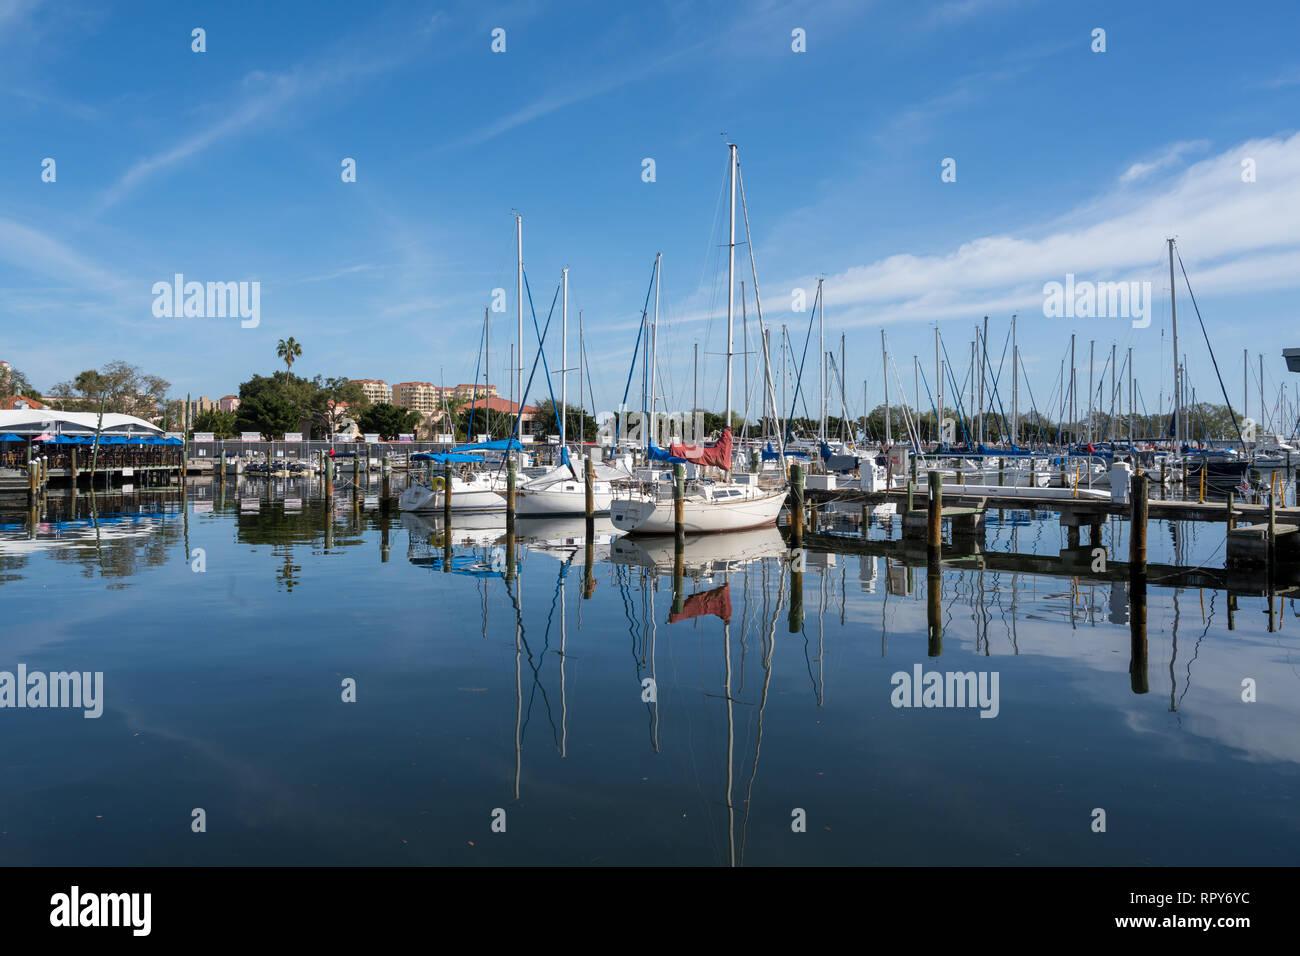 St Petersburg, Florida, USA -- February 15, 2019. Boats anchored at a Florida marina on a February morning. - Stock Image